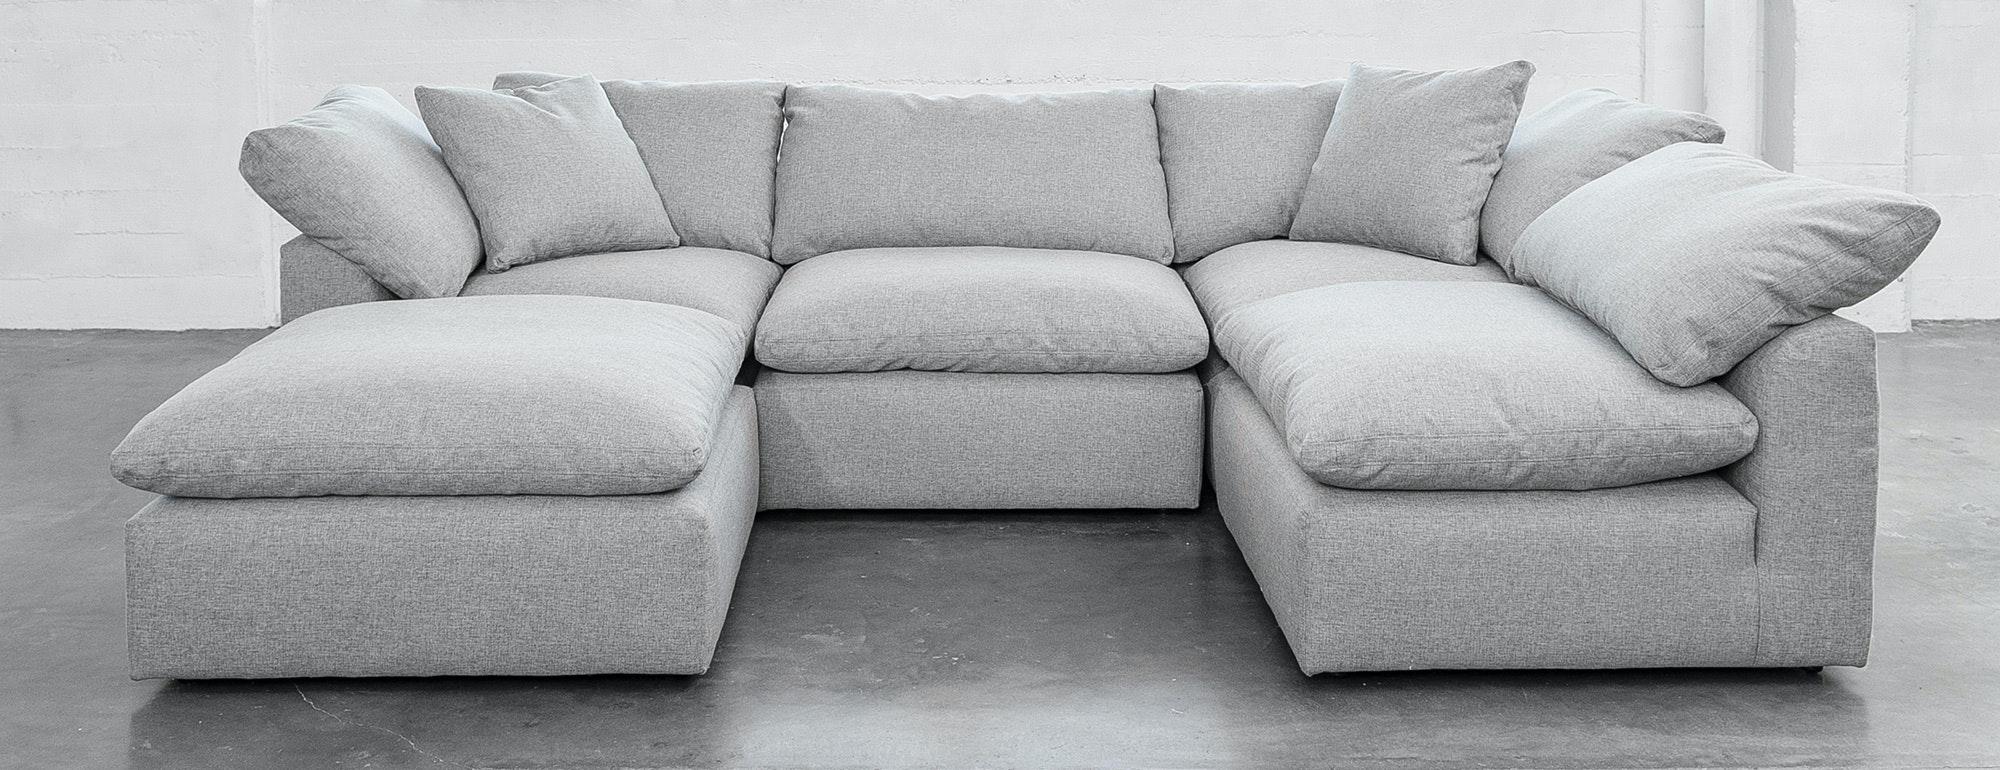 bryant u sofa bumper sectional joybird. Black Bedroom Furniture Sets. Home Design Ideas